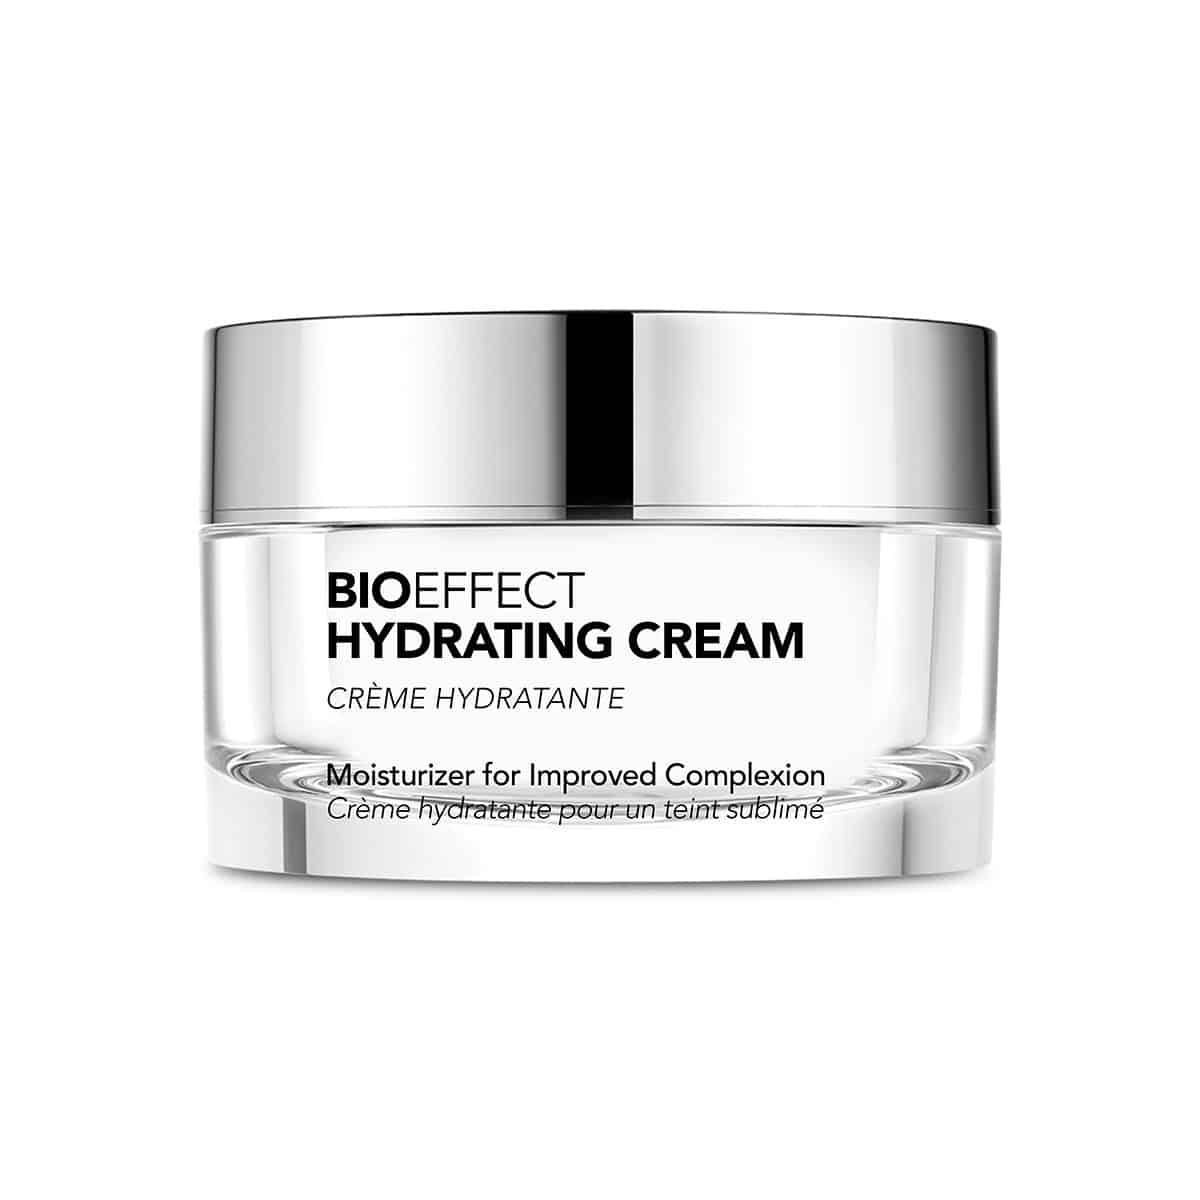 BIOEFFECT Hydrating Cream 30ml